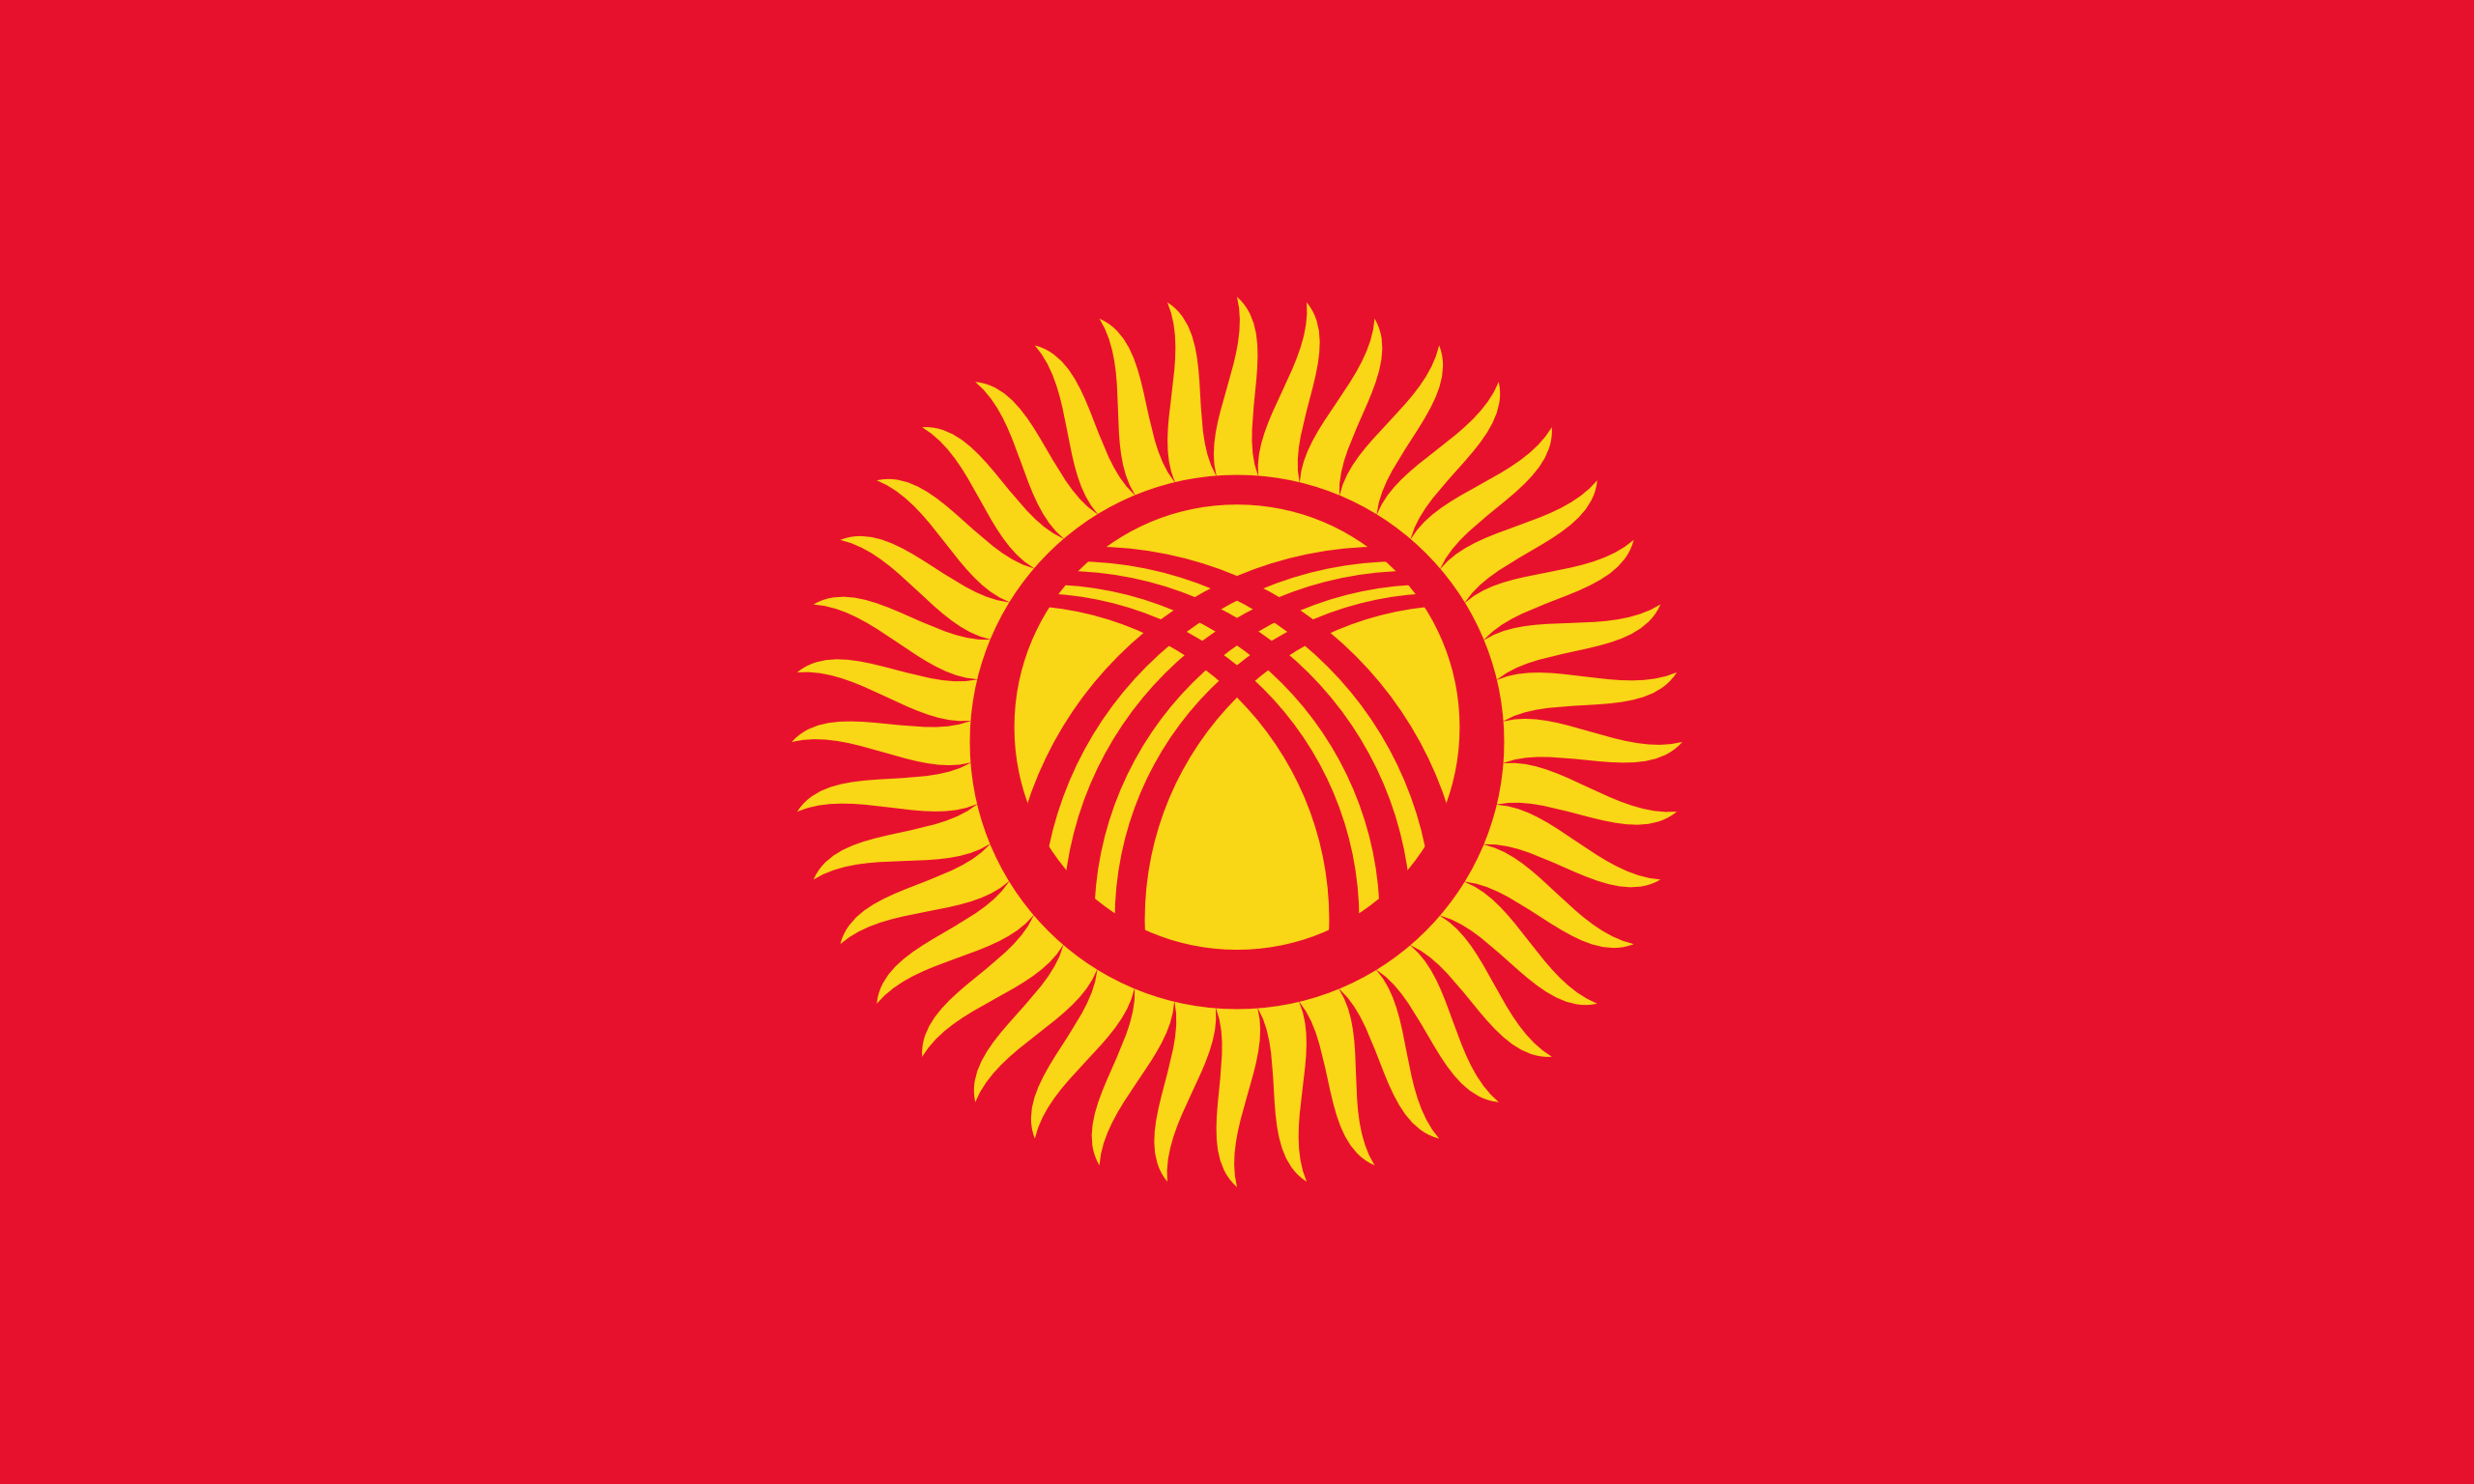 kirguistán, paese, emblema, logo, simbolo - Sfondi HD - Professor-falken.com